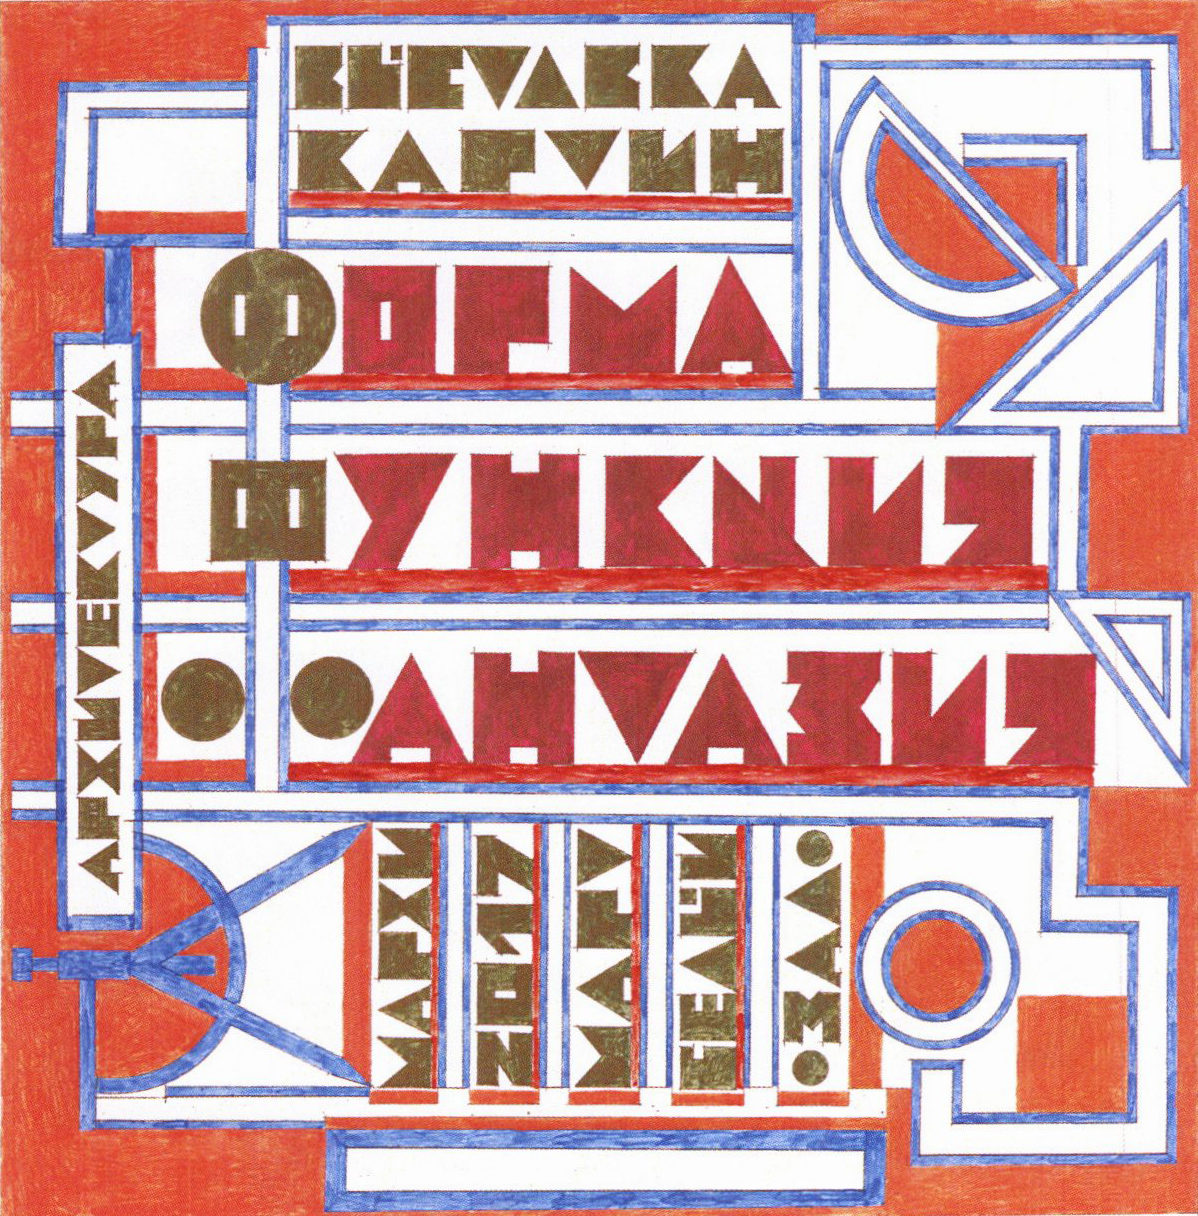 Открытие выставки Владимира Киселёва «Форма – Функция – Фантазия»